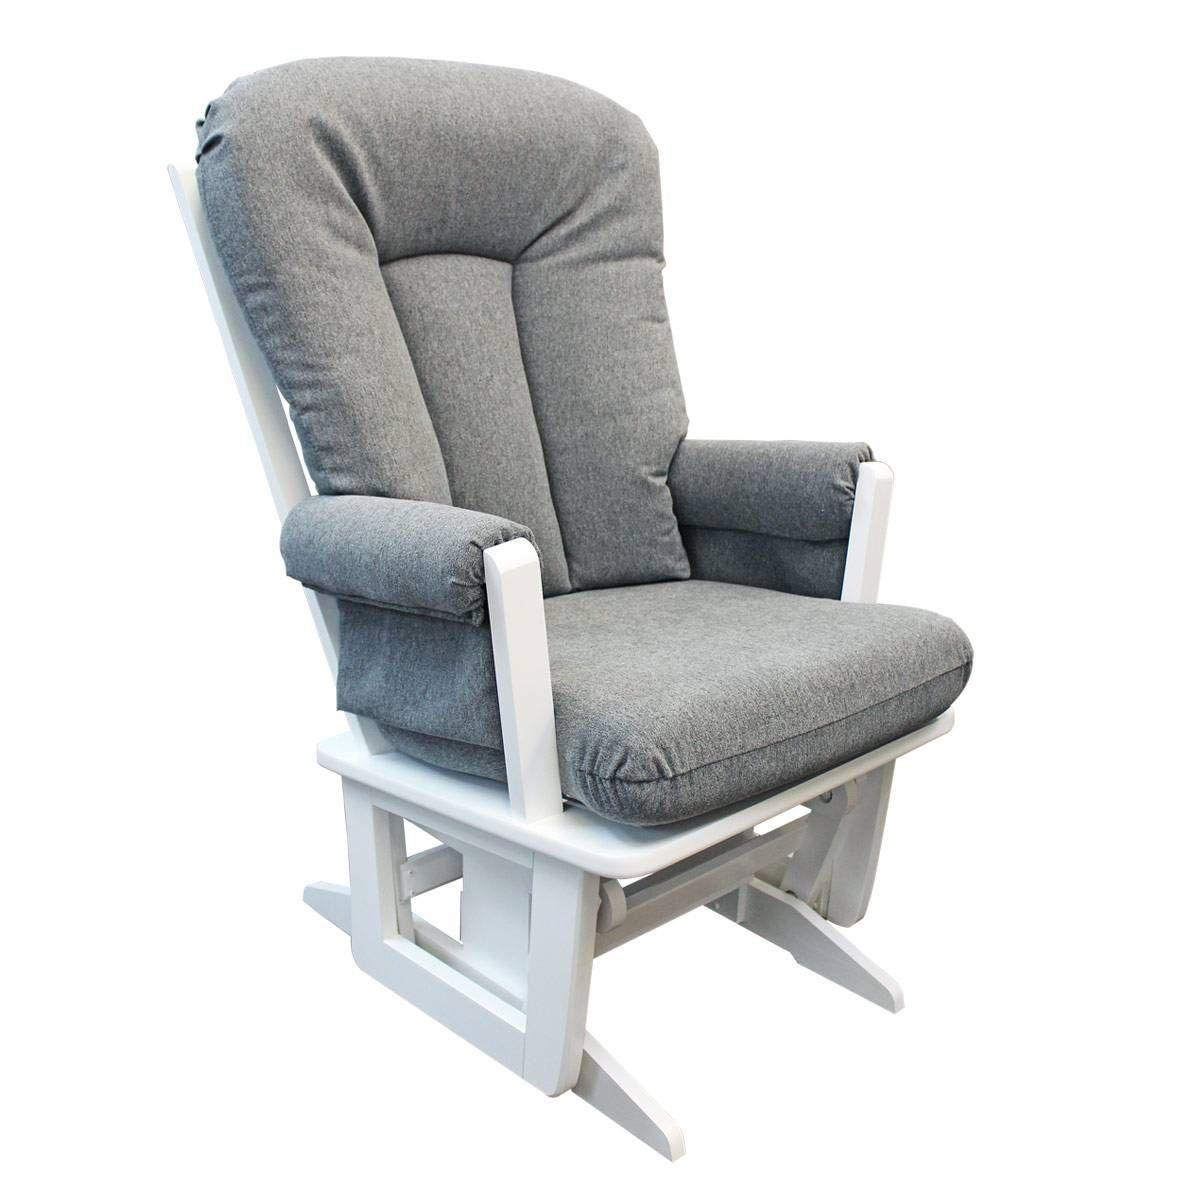 Chaise Bercante Bois Blanc Et Tissu Gris 3128 Dutailier Clement Modern Gliders Recliner Chair White Wood